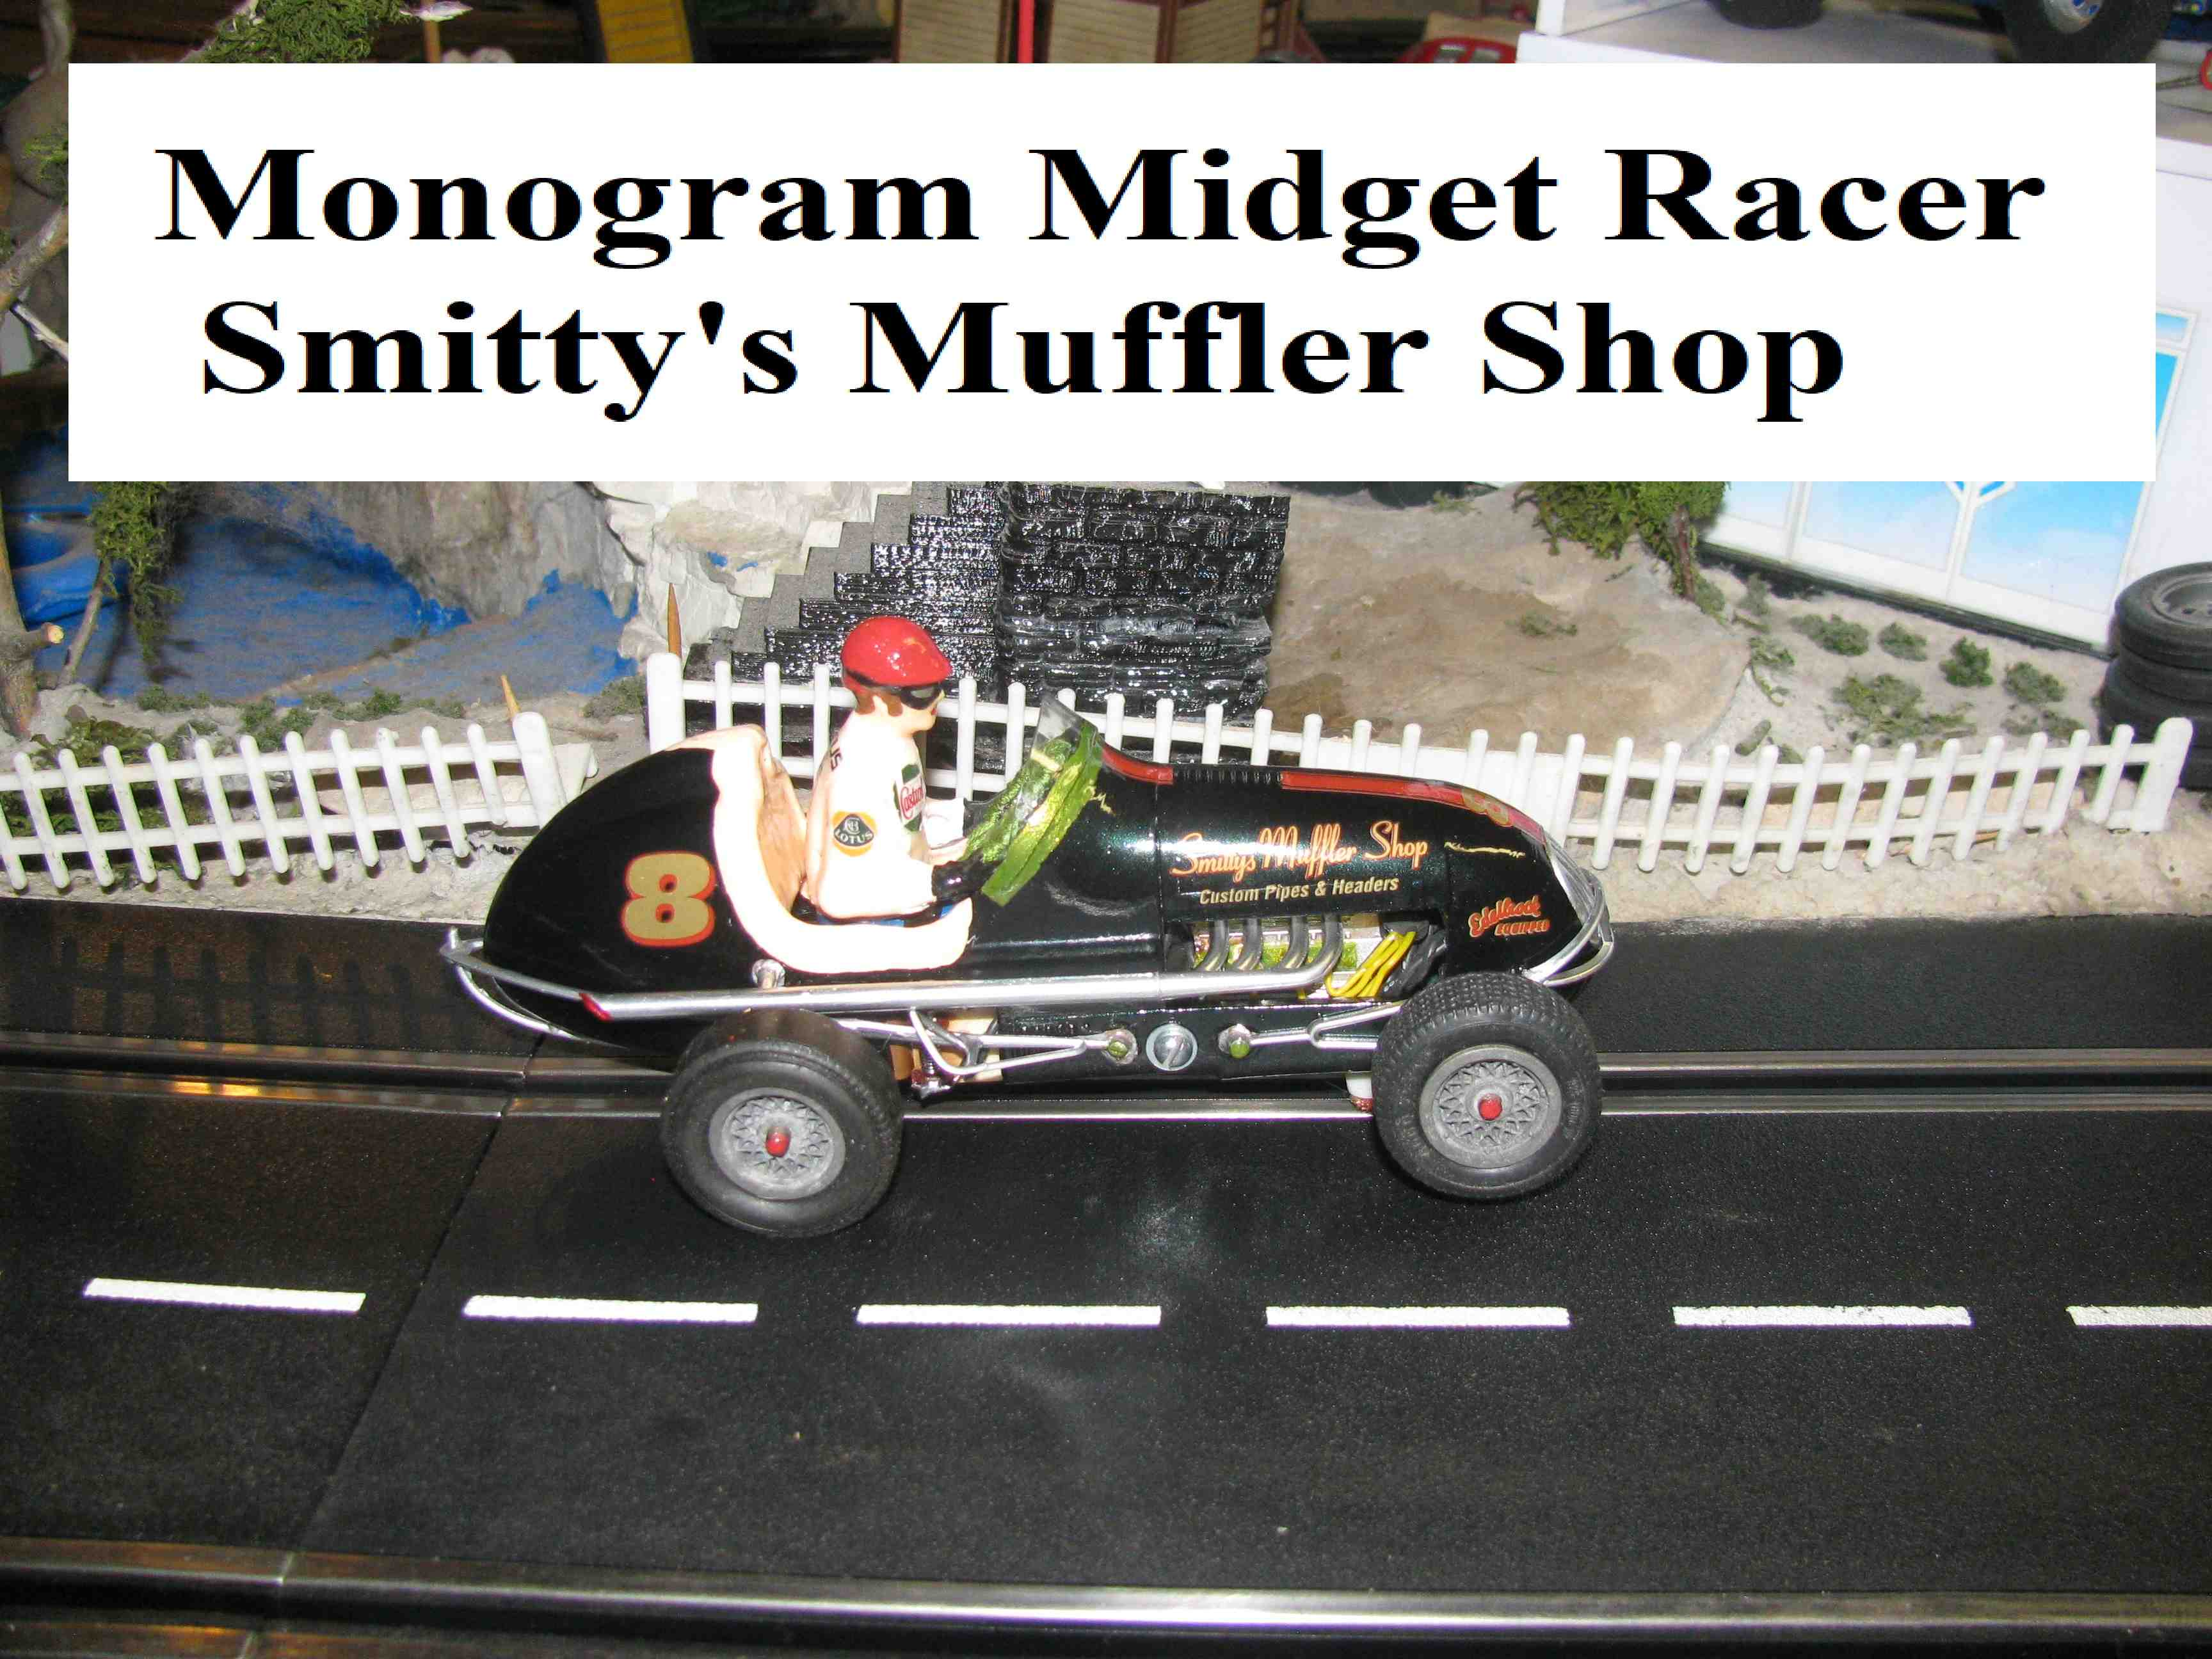 * Winter Super Sale * Monogram Midget Racer Land Cruiser Green Racing Special Slot Car 1/24 Scale (Land Cruiser Green Metallic)